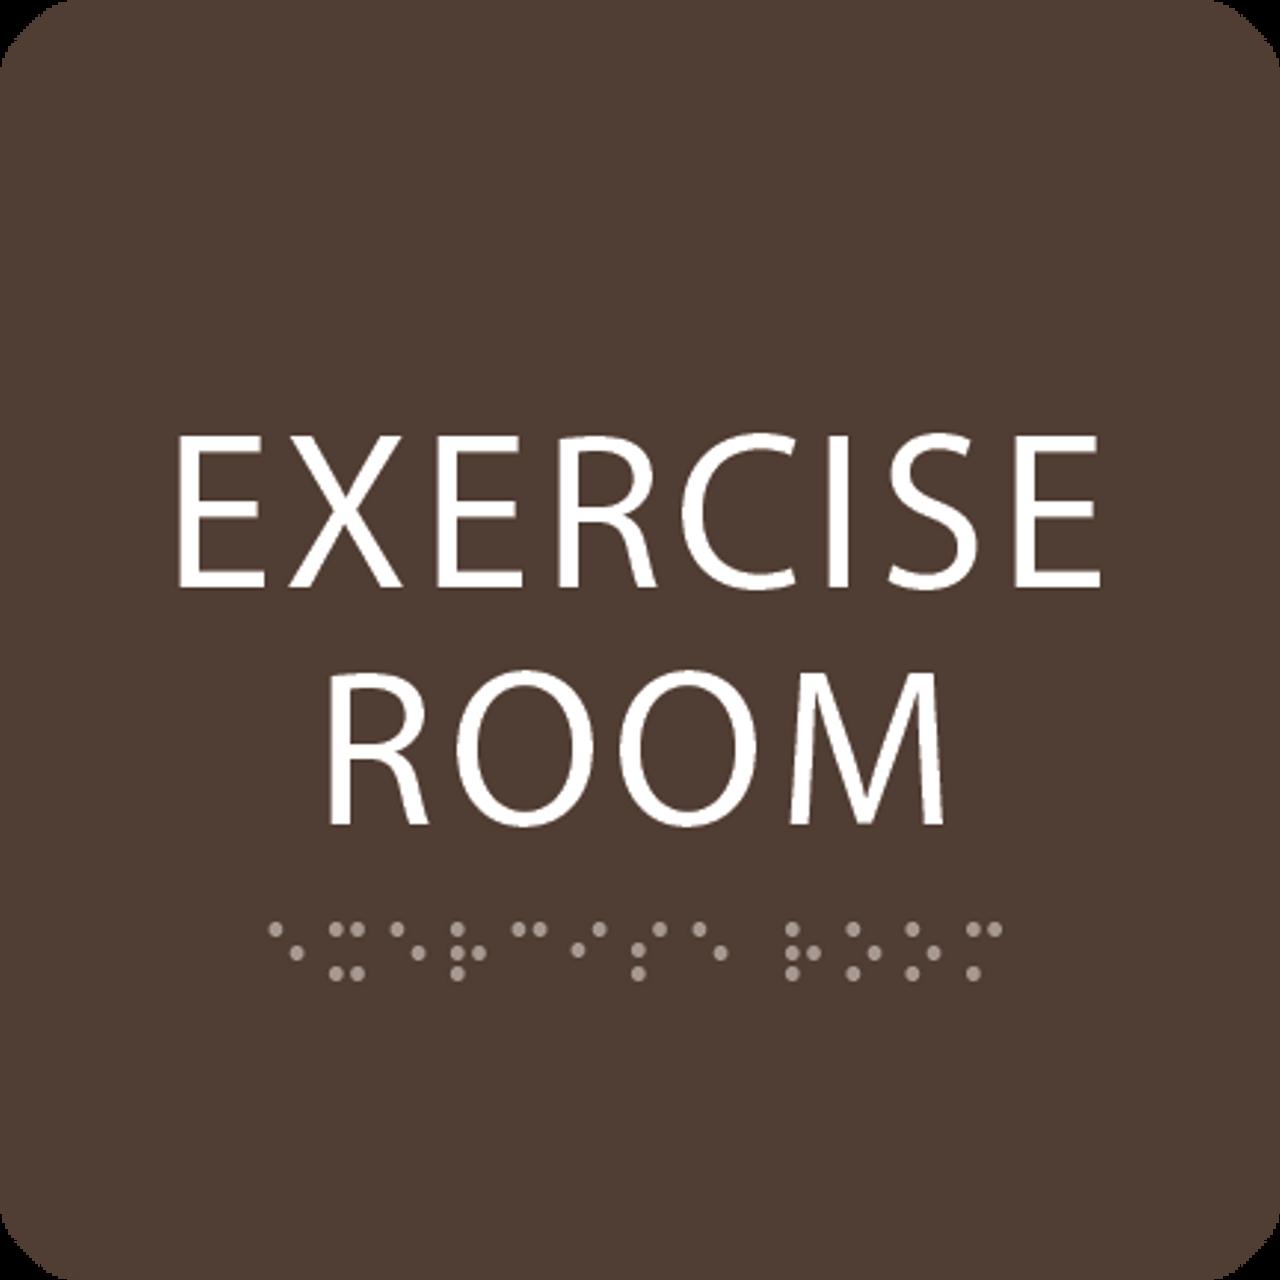 Dark Brown Exercise Room ADA Sign